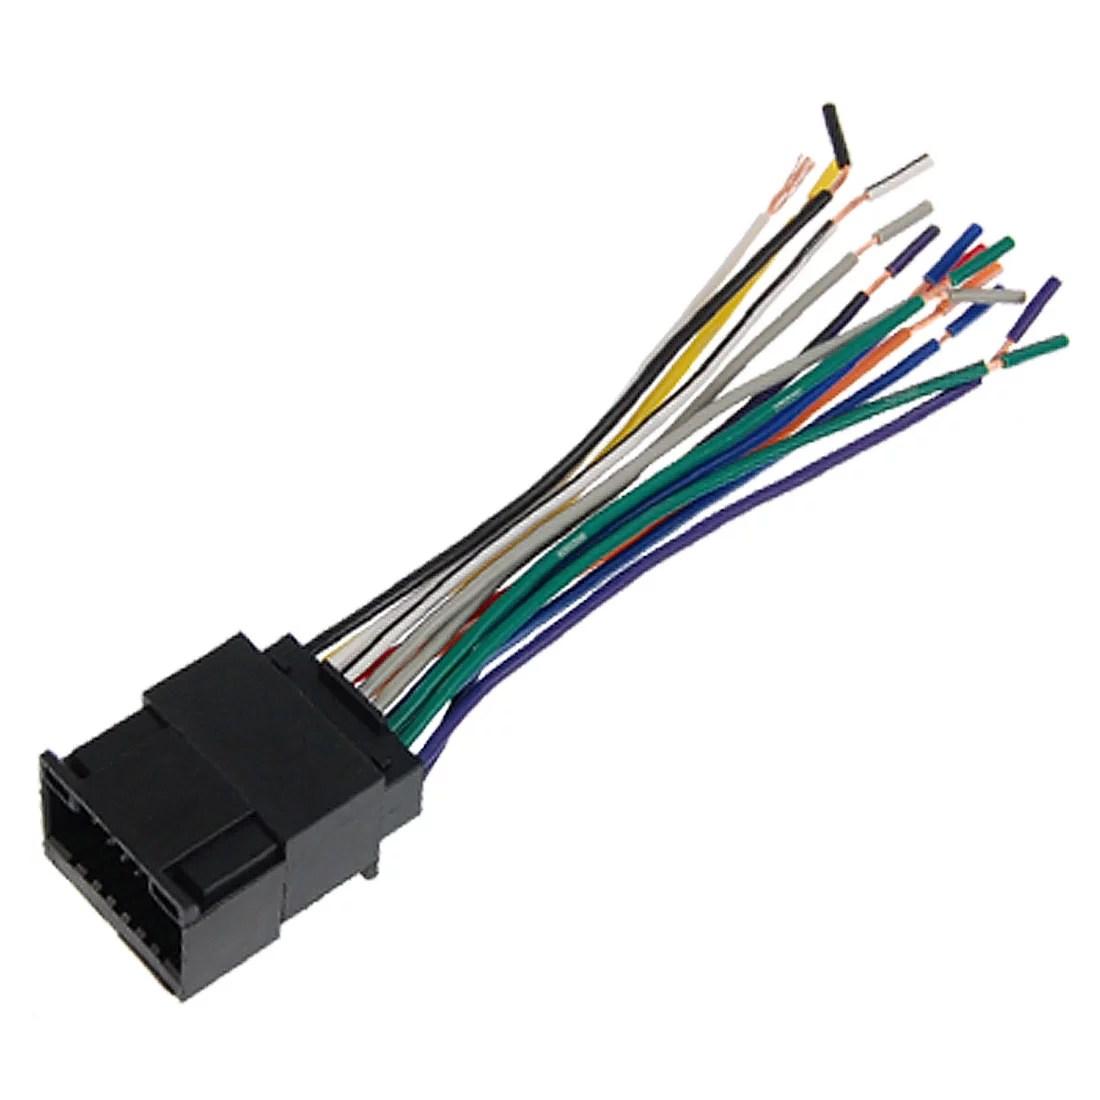 Scosche Gm2000 Gm Radio Car Stereo Wire Wiring Harness Auto Gallery